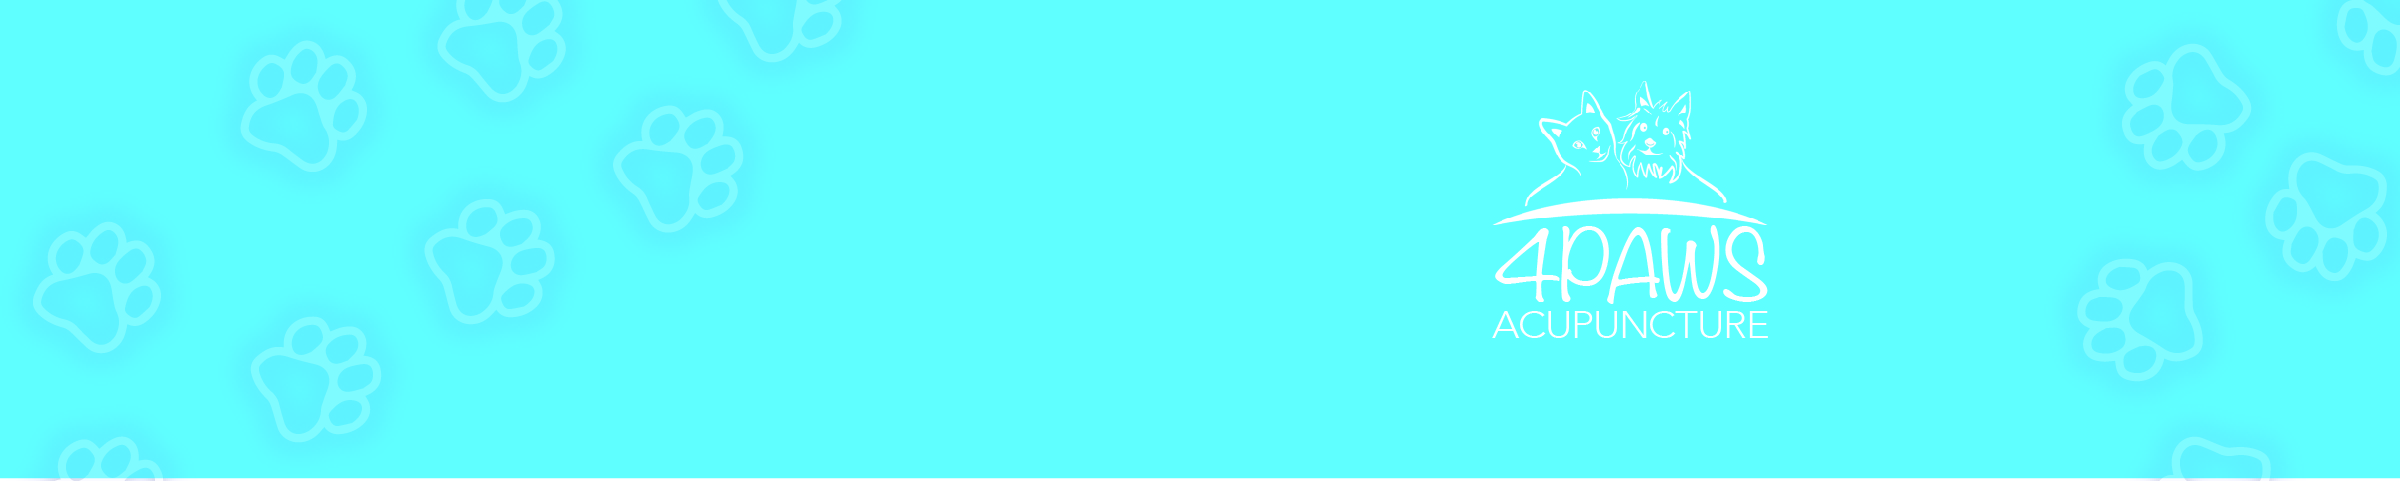 Banner 2@2x-100.jpg